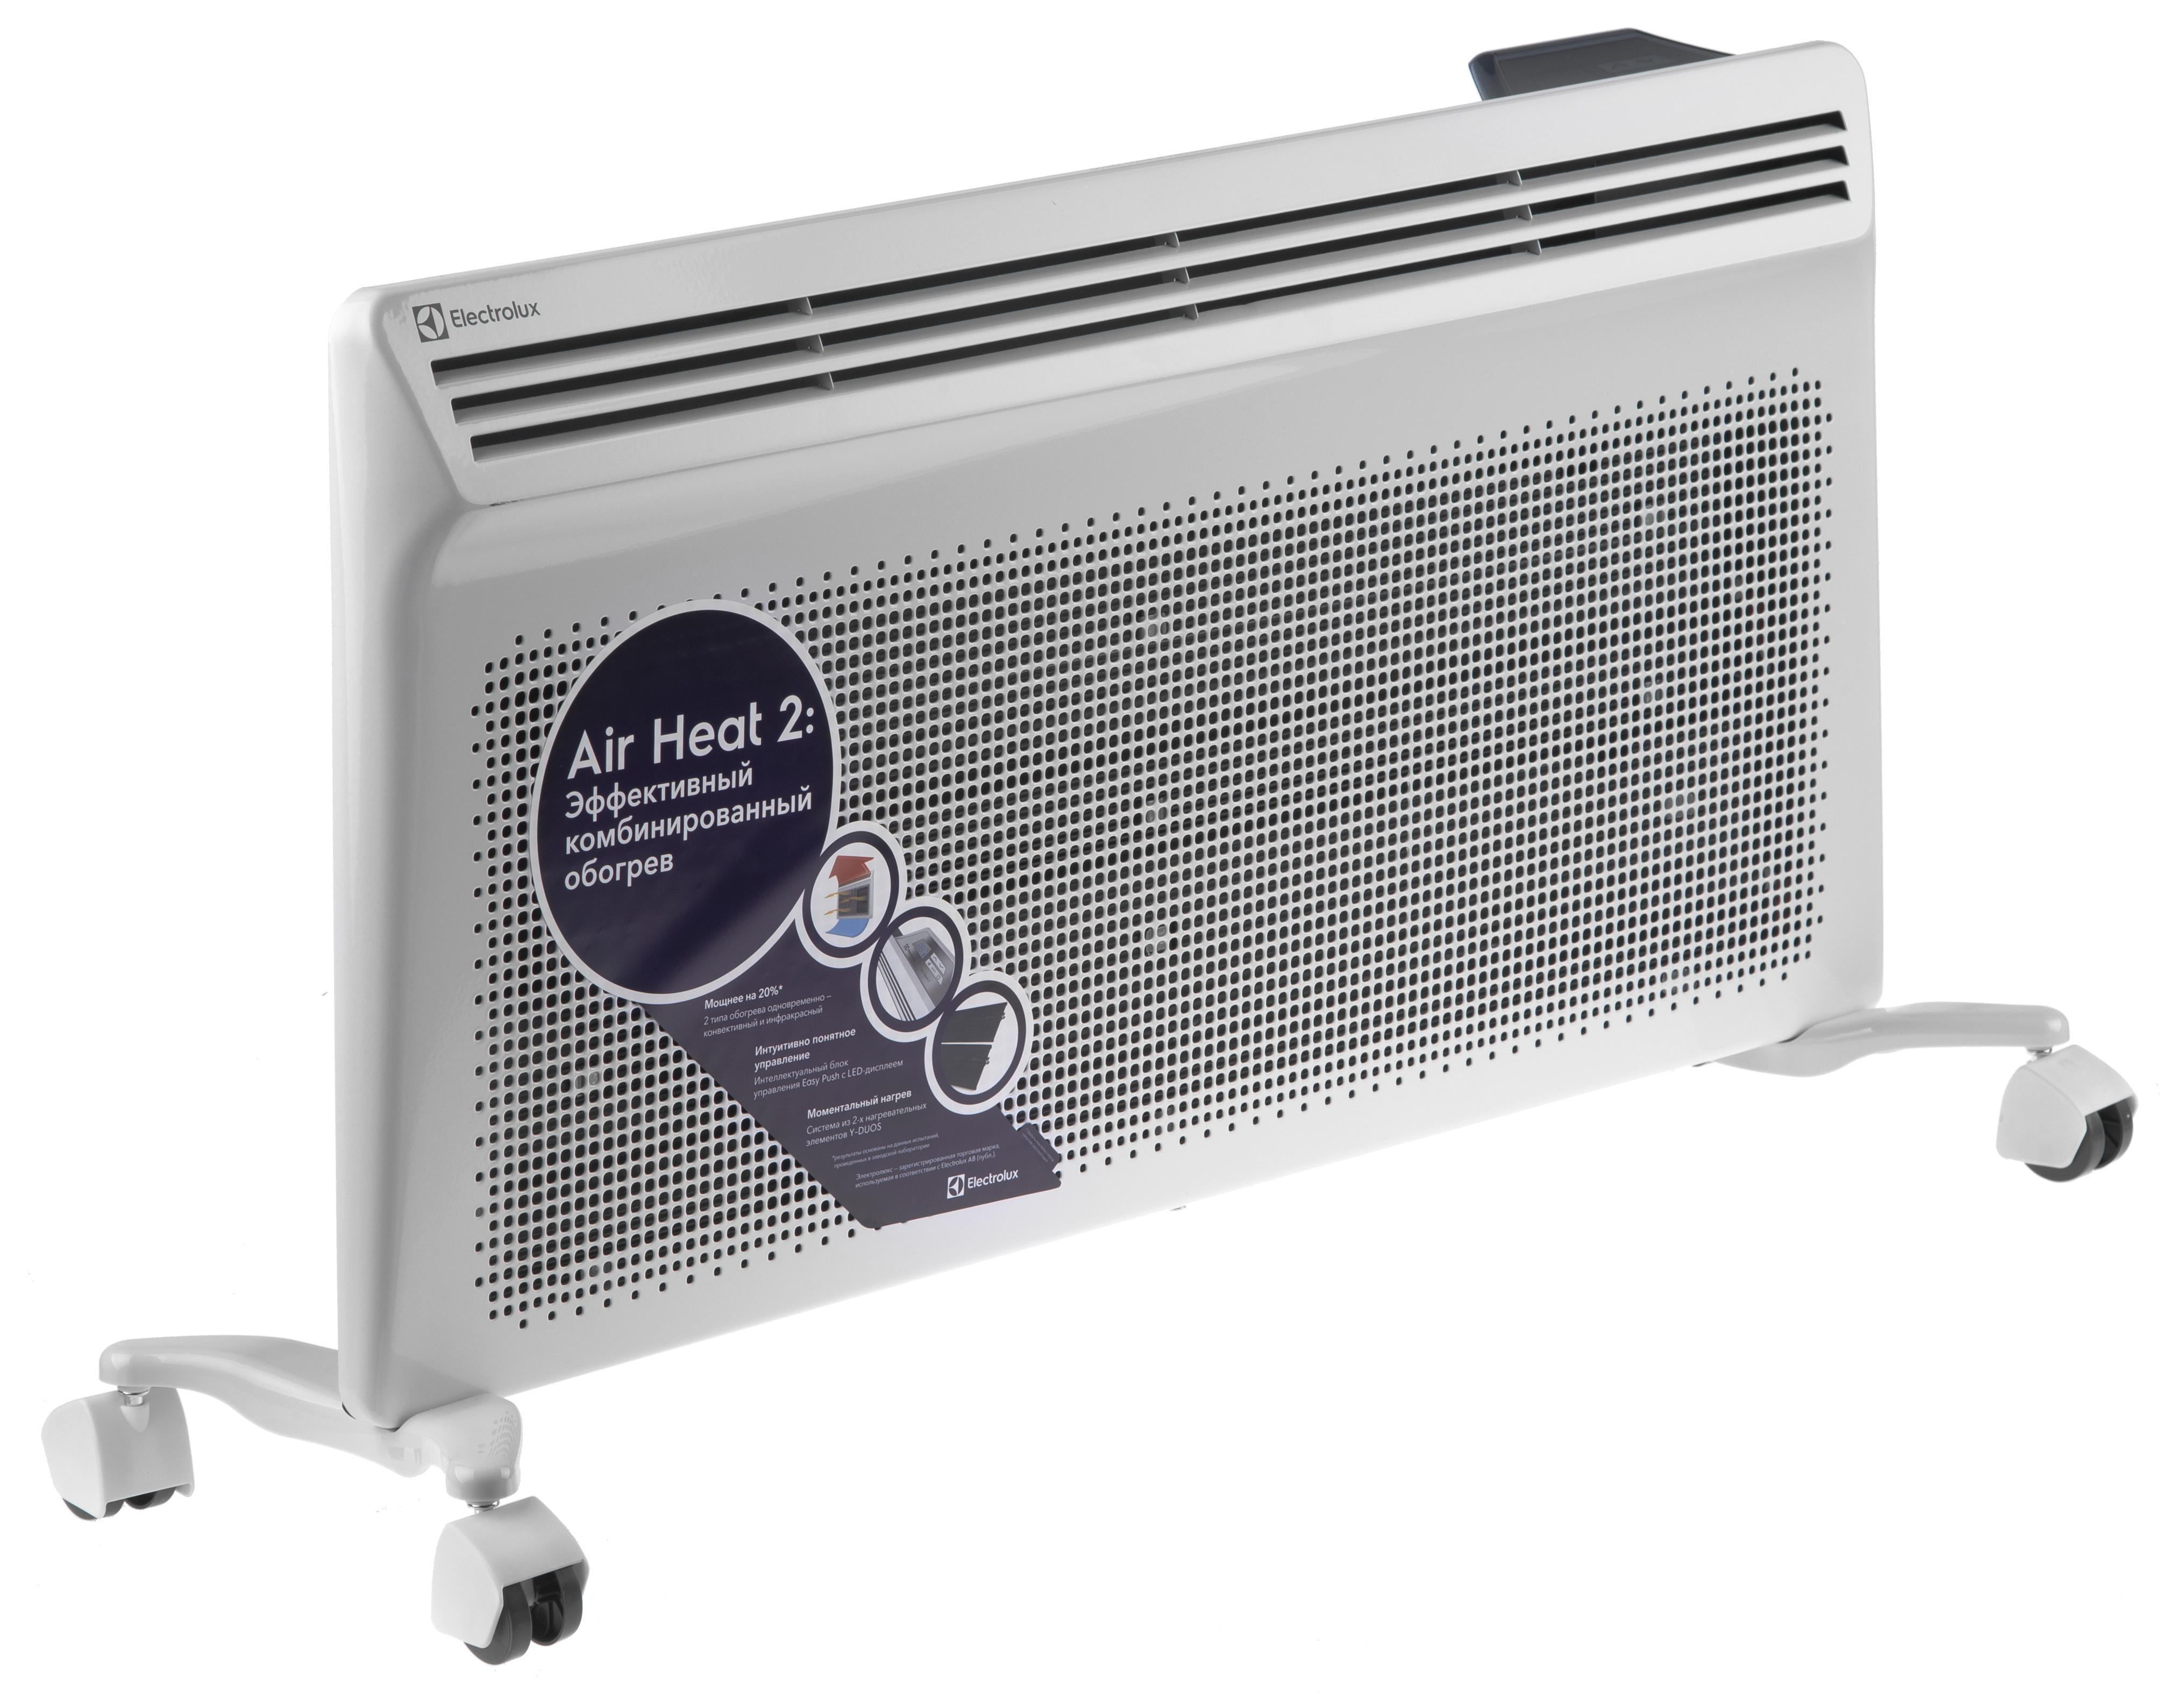 Конвектор Electrolux Eih/ag2 – 2000  (НС-1042067)